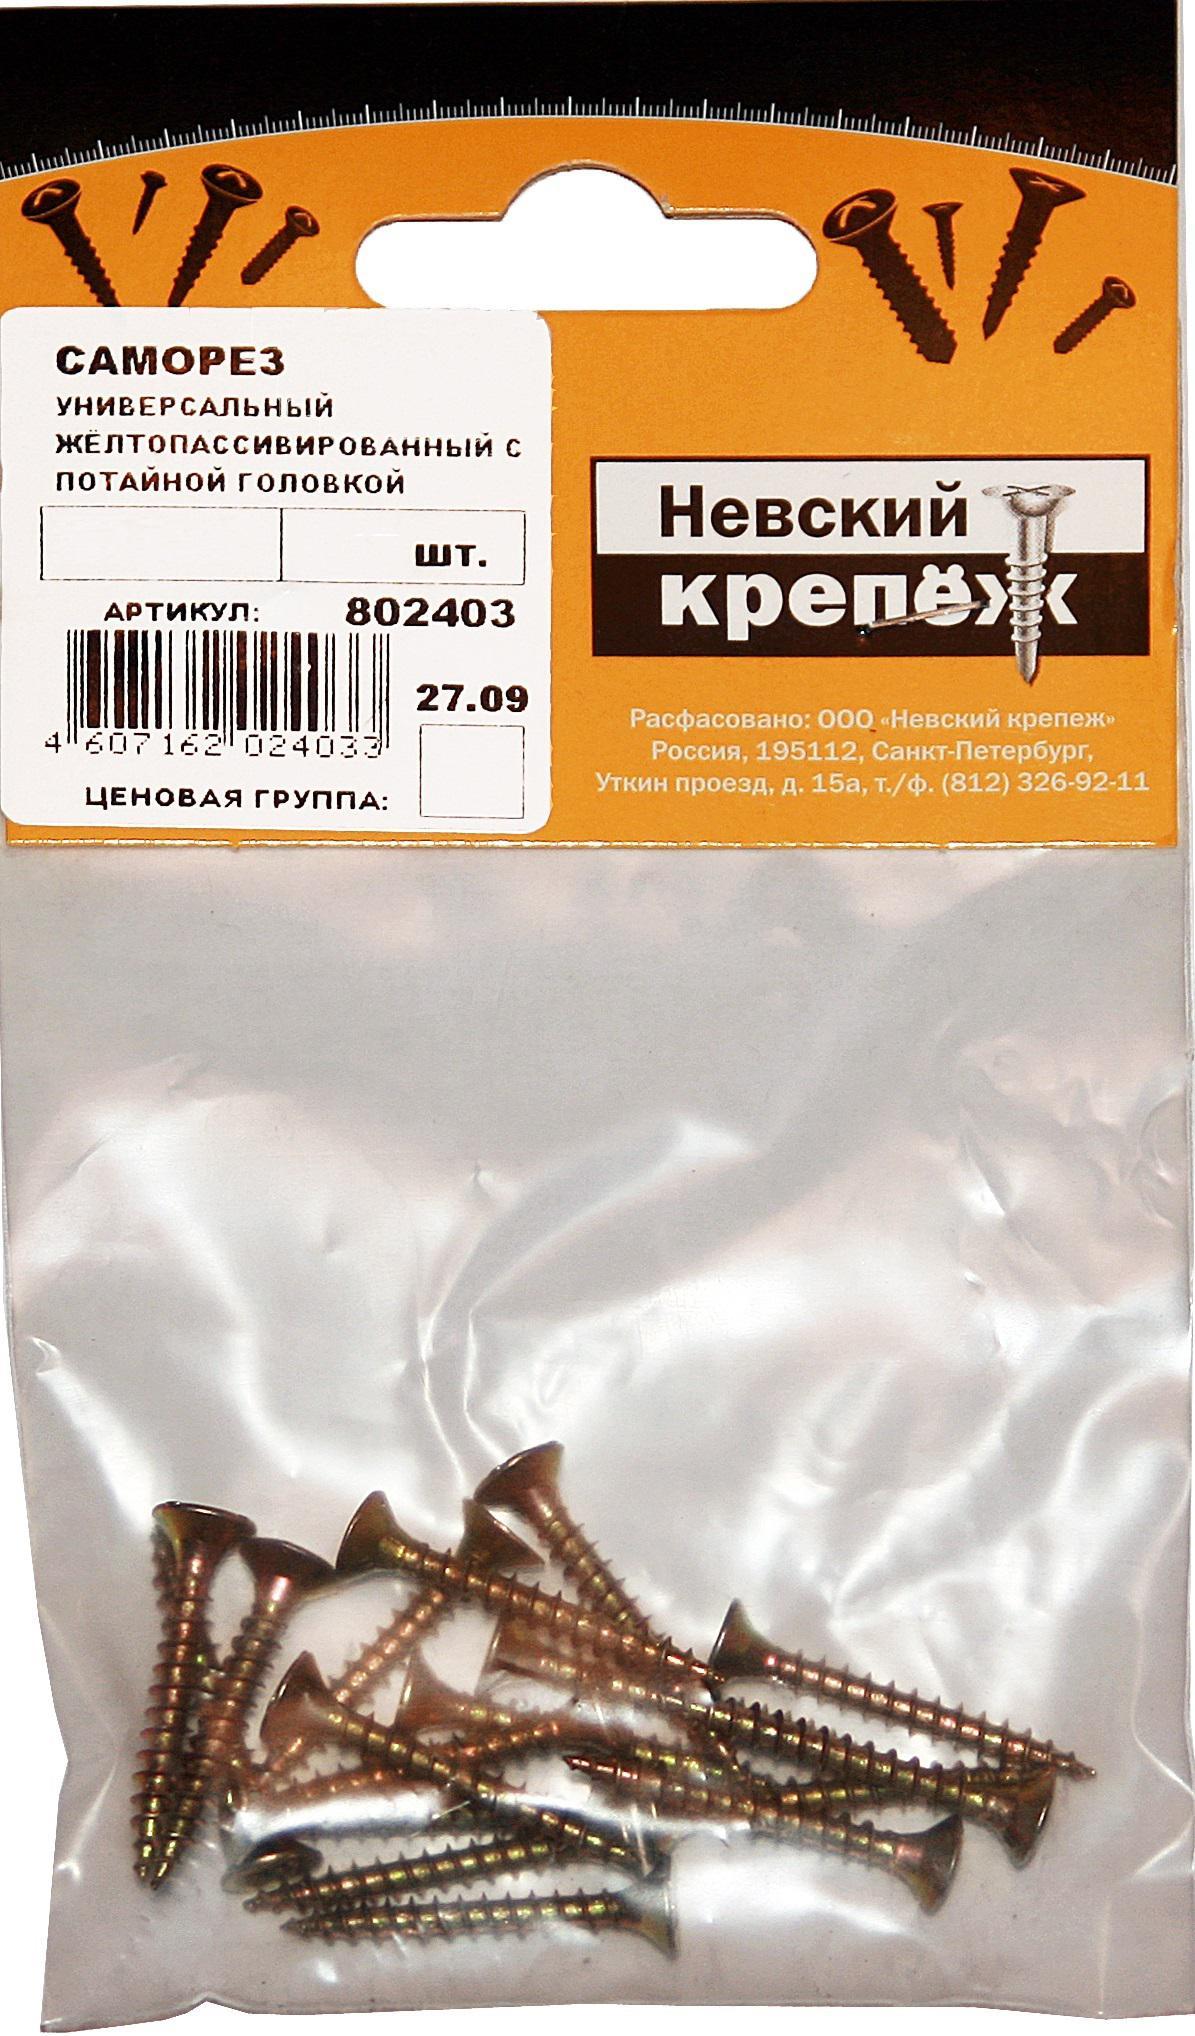 Саморез НЕВСКИЙ КРЕПЕЖ 802385